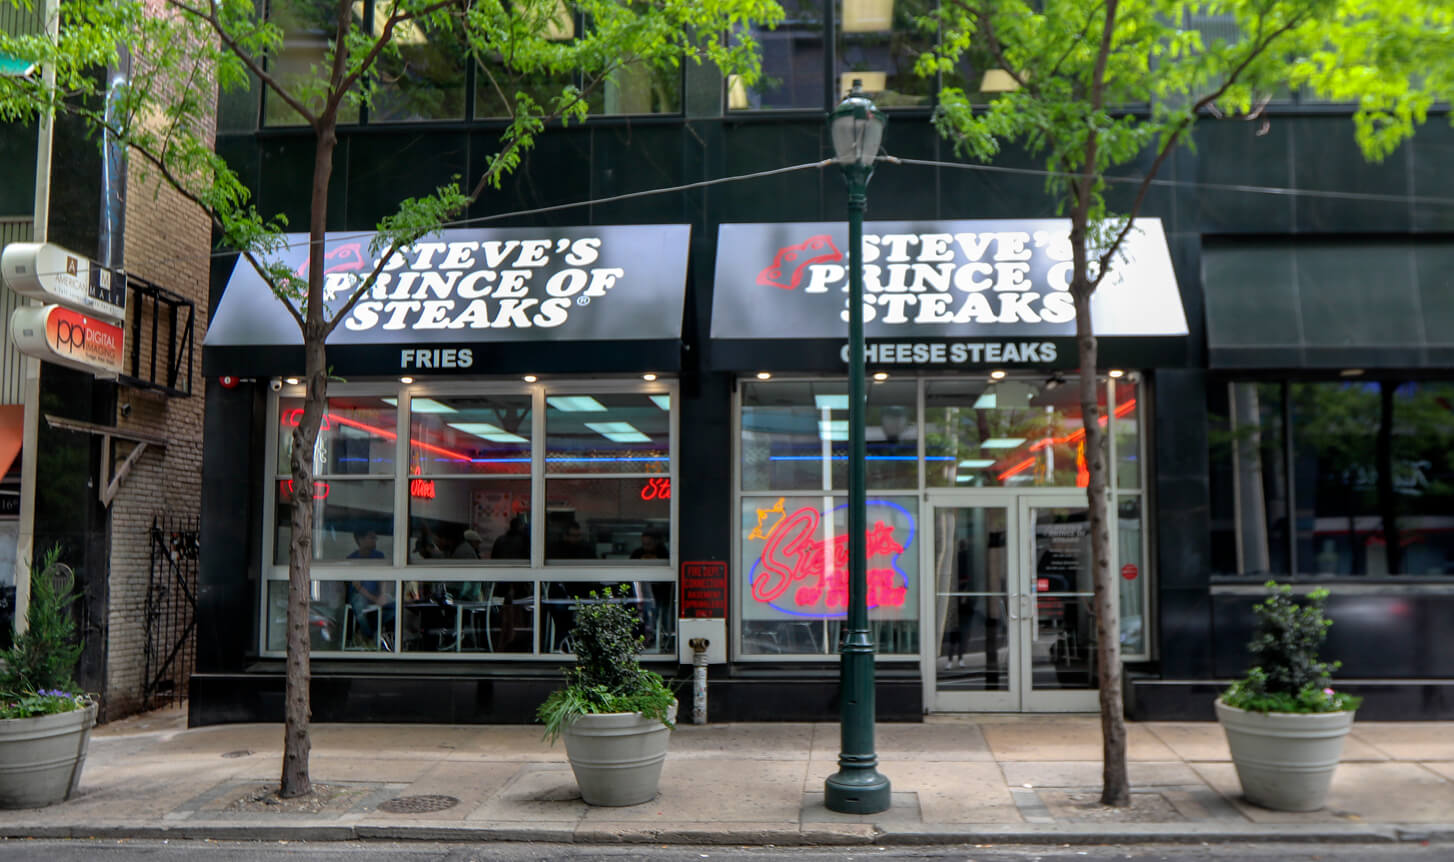 Top Philly Cheesesteak in Philadelphia - Steve's Prince of Steaks